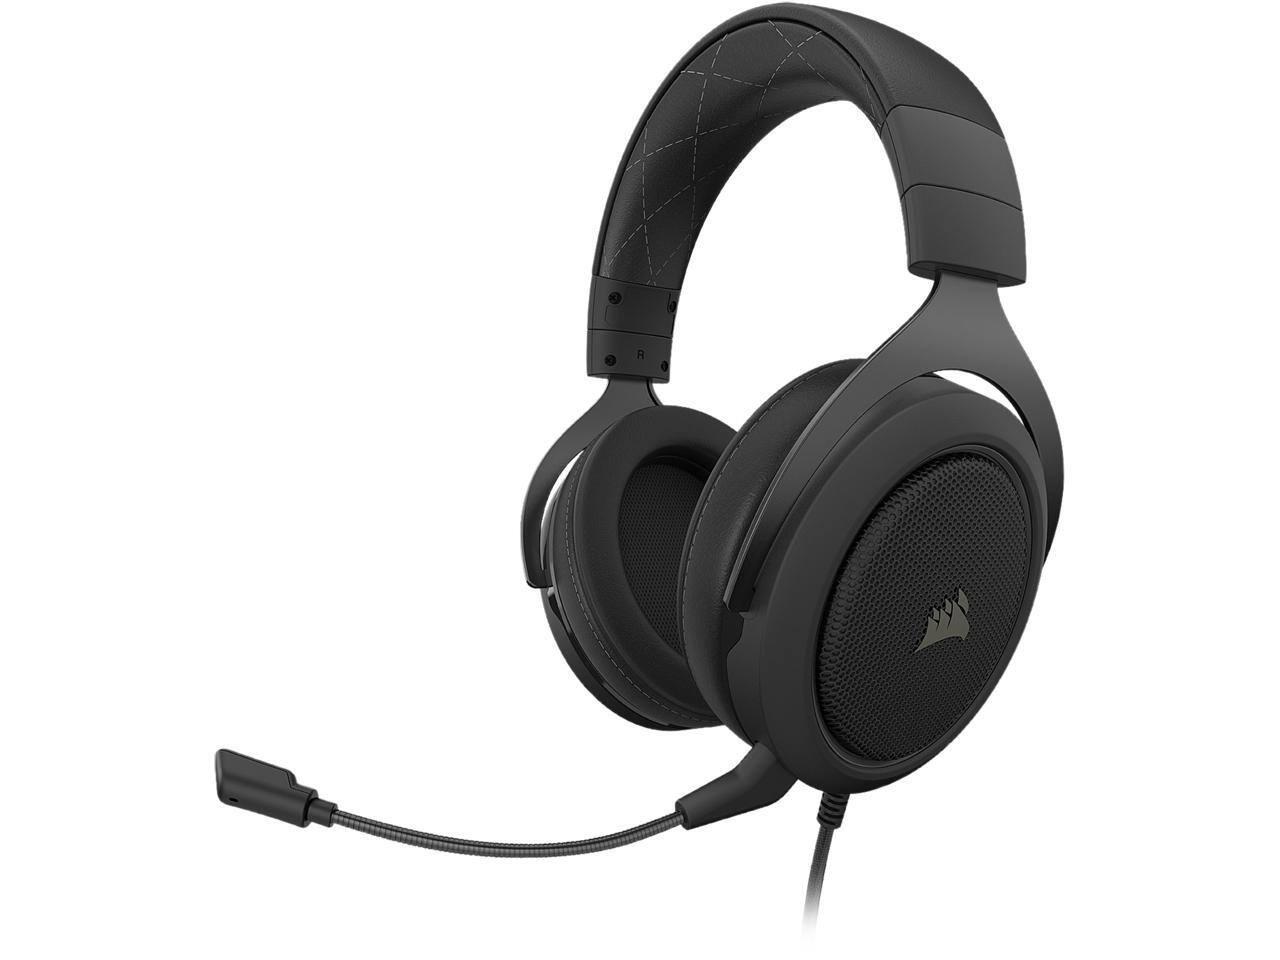 Corsair HS60 PRO SURROUND 3.5mm Connector Circumaural Gaming Headset - $49.99 + FS